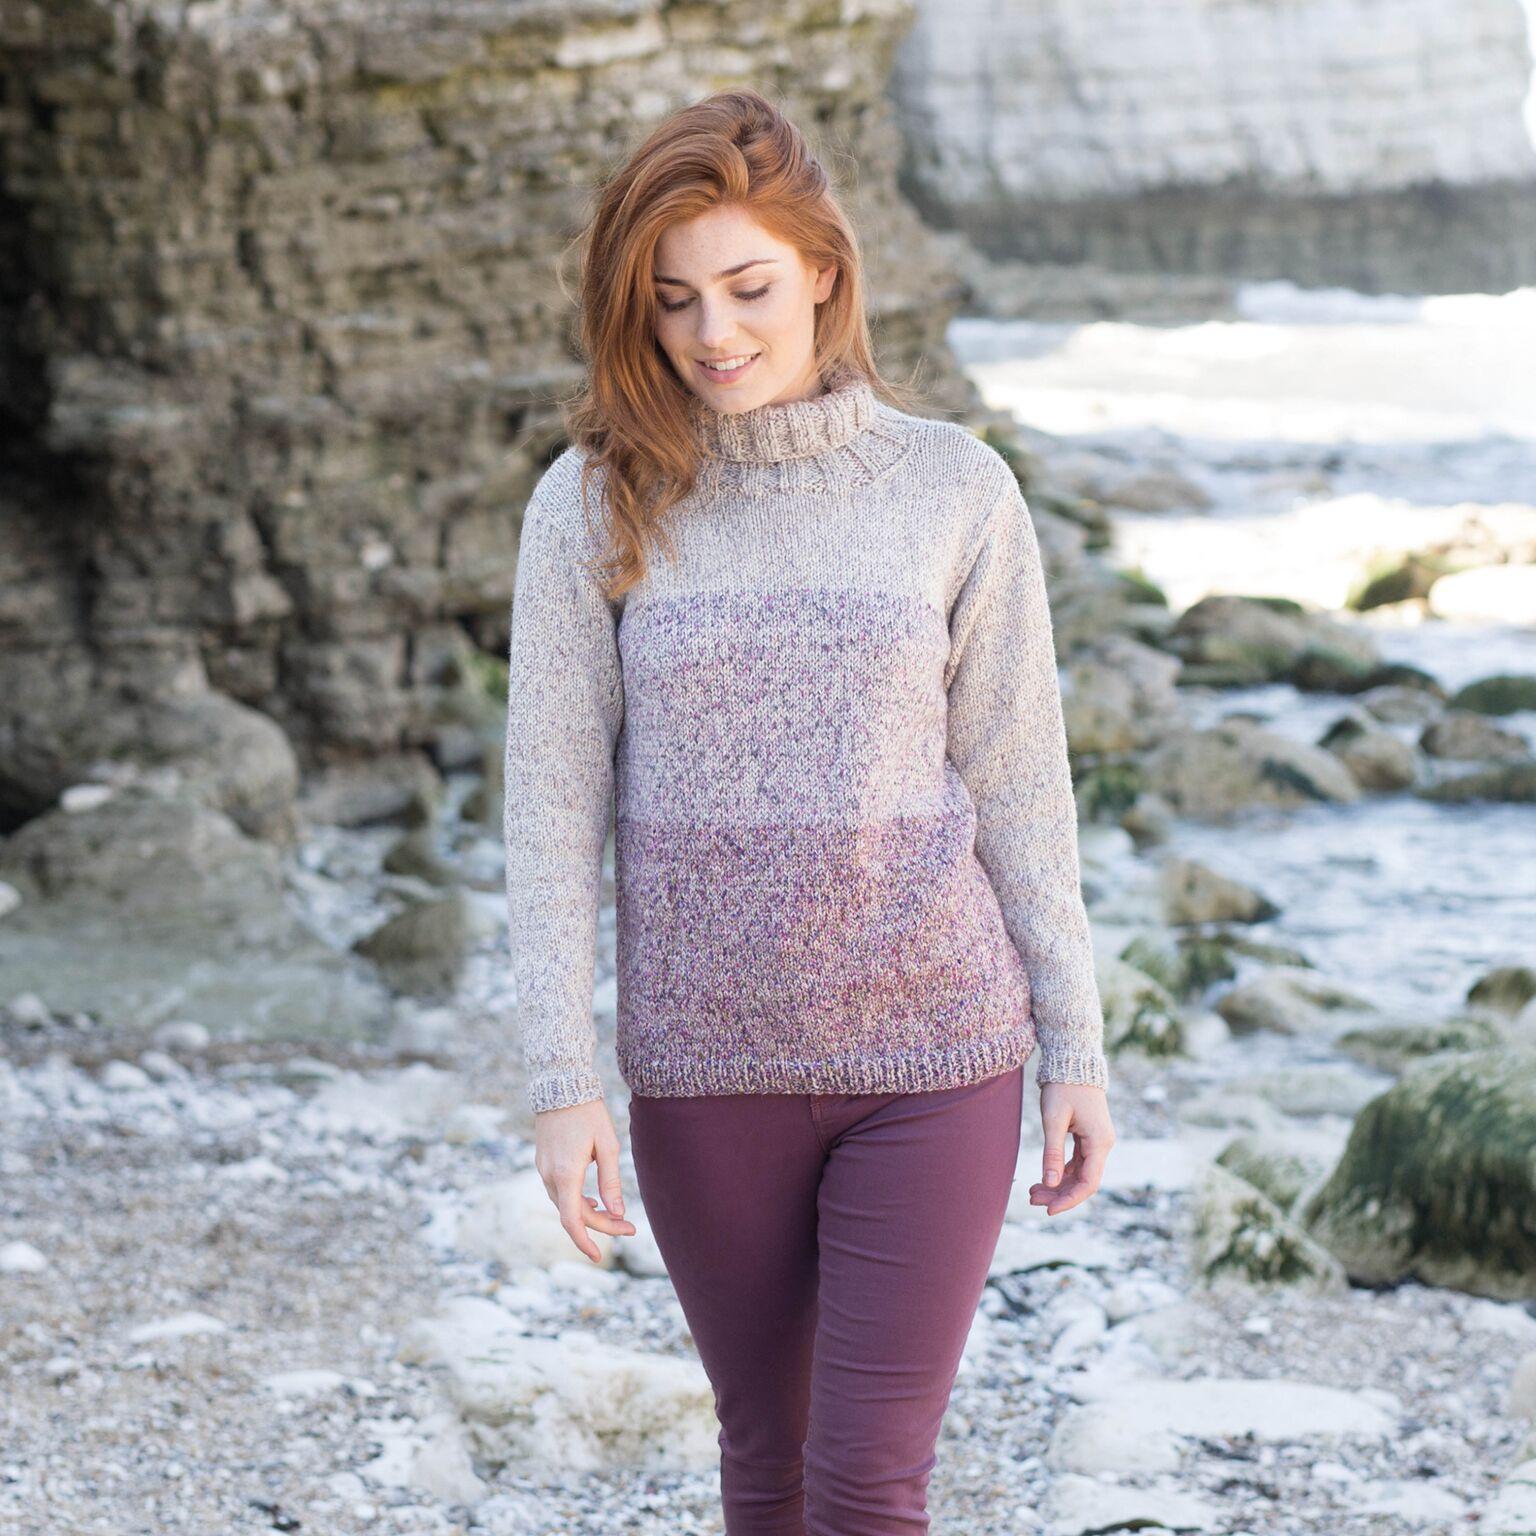 wys-croft-emeliasweater.jpg